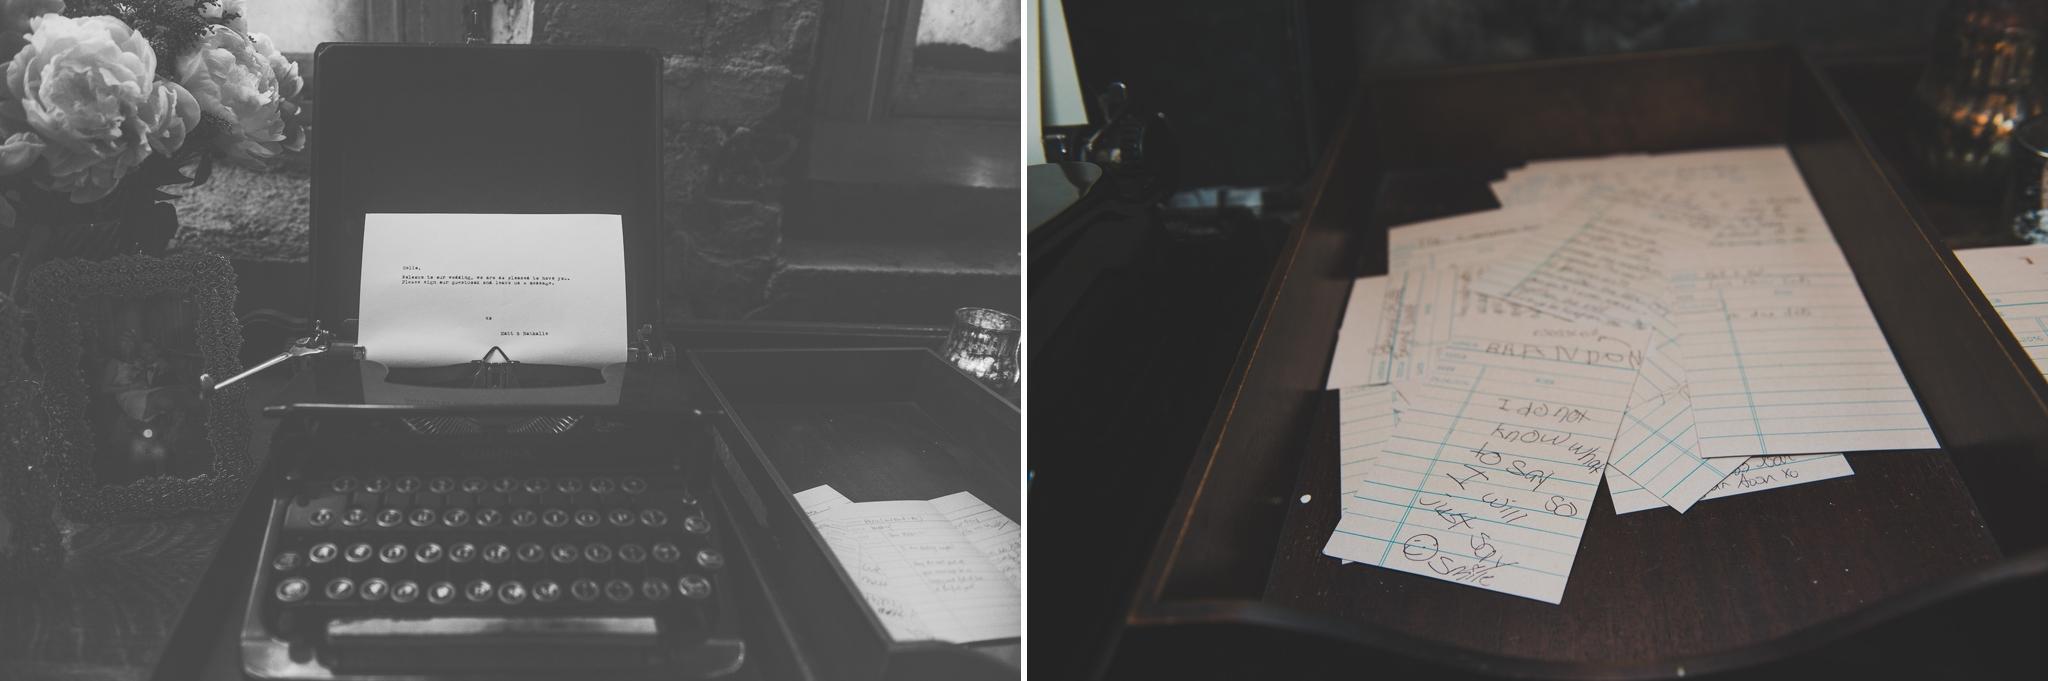 Downtown Toronto wedding, Toronto Wedding, brick, urban, urban toronto wedding, urban wedding photographer, urban wedding photographer, Toronto Wedding Photographer, Downtown Toronto, Toronto Photographer, Berkeley Church, Berkeley Events, Berkeley fieldhouse, bride, groom, bride and groom, couple, bridal portrait, portrait, romantic, intimate, church, church wedding, dramatic light, window light, unique location, candids, wedding guests, ceremony, bride, groom, wedding ceremony, aisle, musician, cocktail hour, party, wedding decor, wedding tables, wedding gifts, table settings, details, wedding details, unique guest book